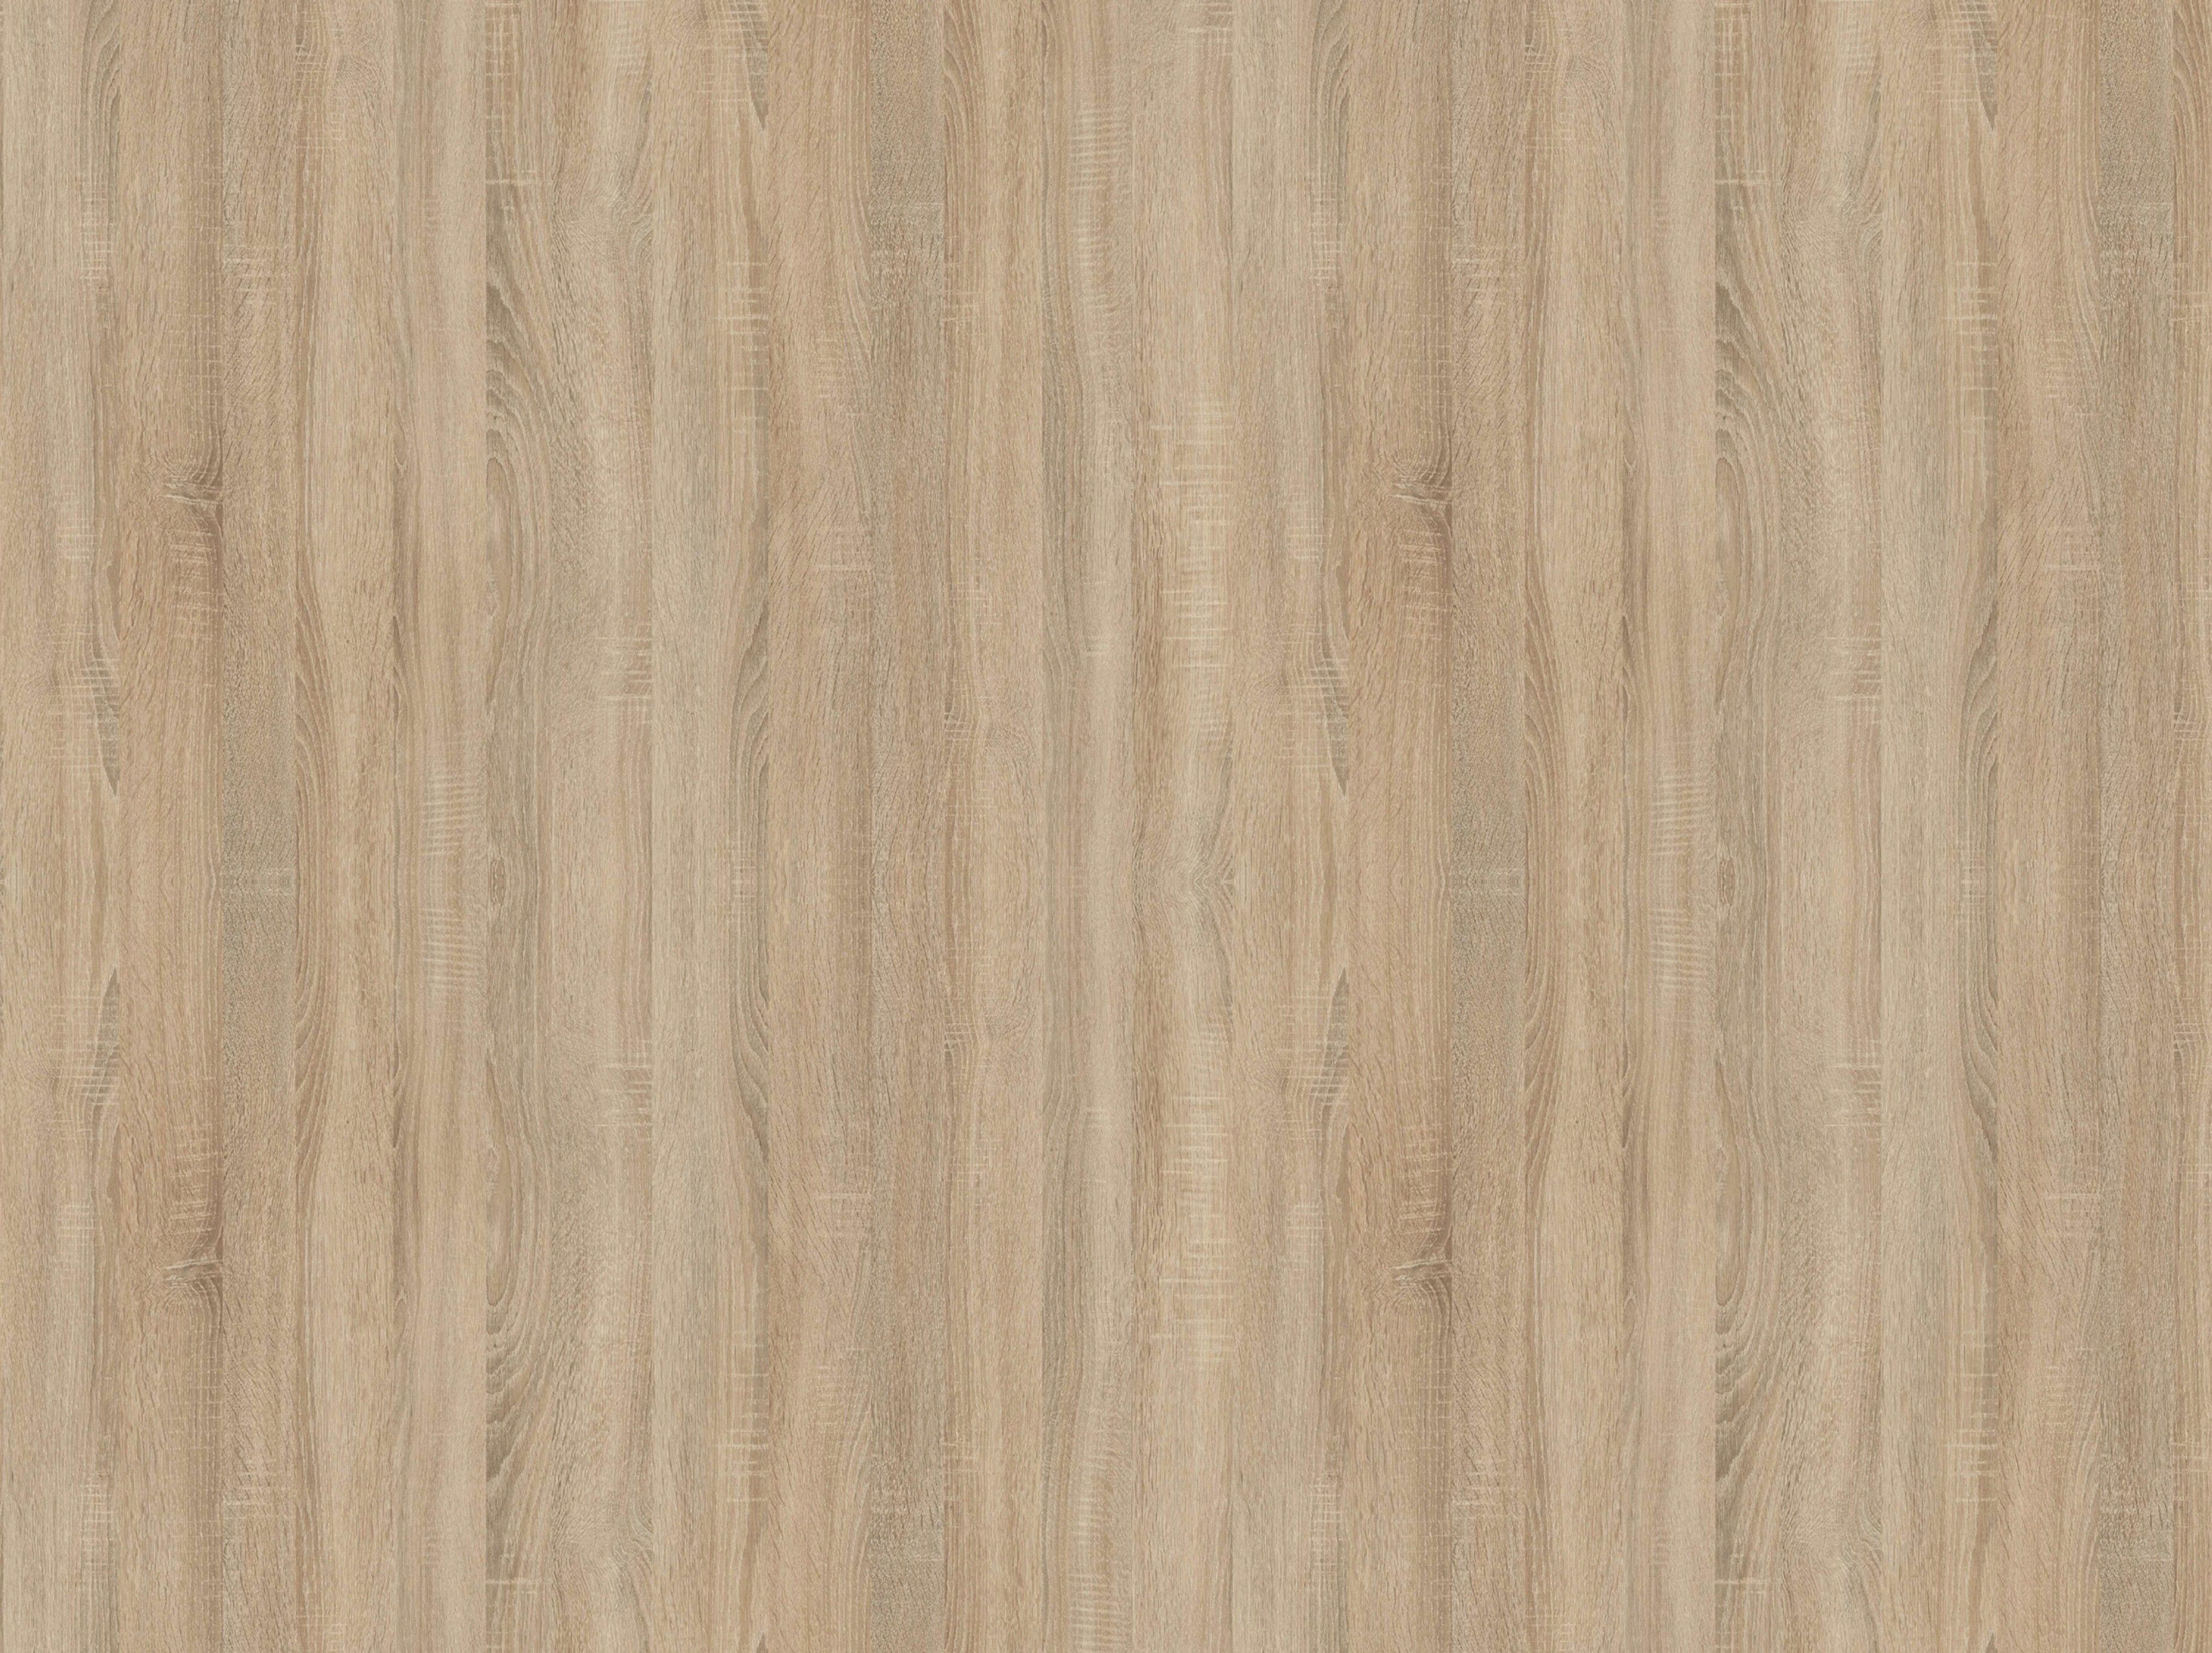 Seamless Bordolino Wood Veneer Texture Kozatch Photoshop